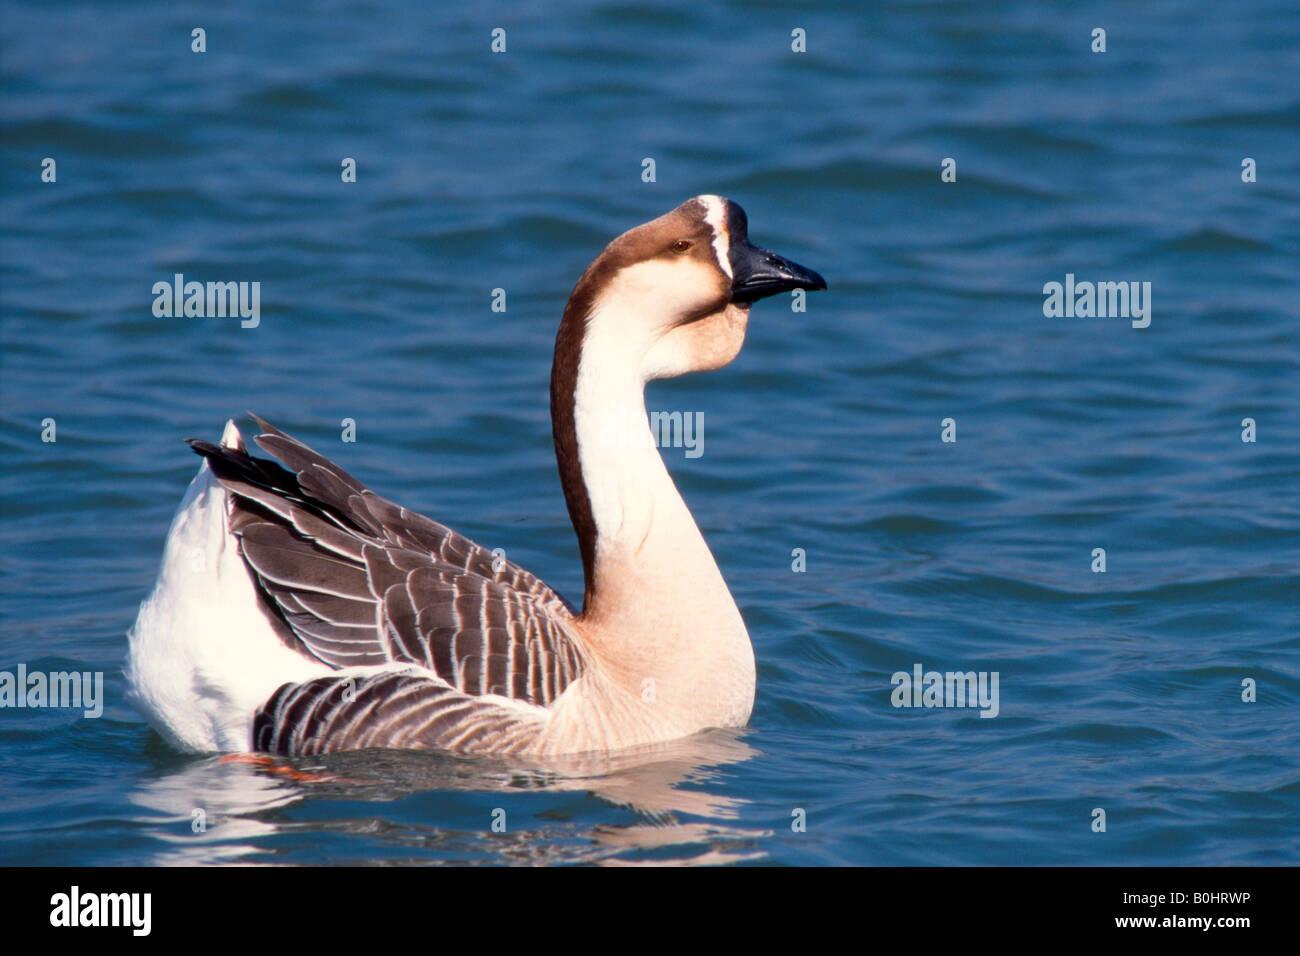 Domesticated Swan Goose (Anser cygnoides f. domestica), Inn River, Ebbs, Tyrol, Austria, Europe - Stock Image